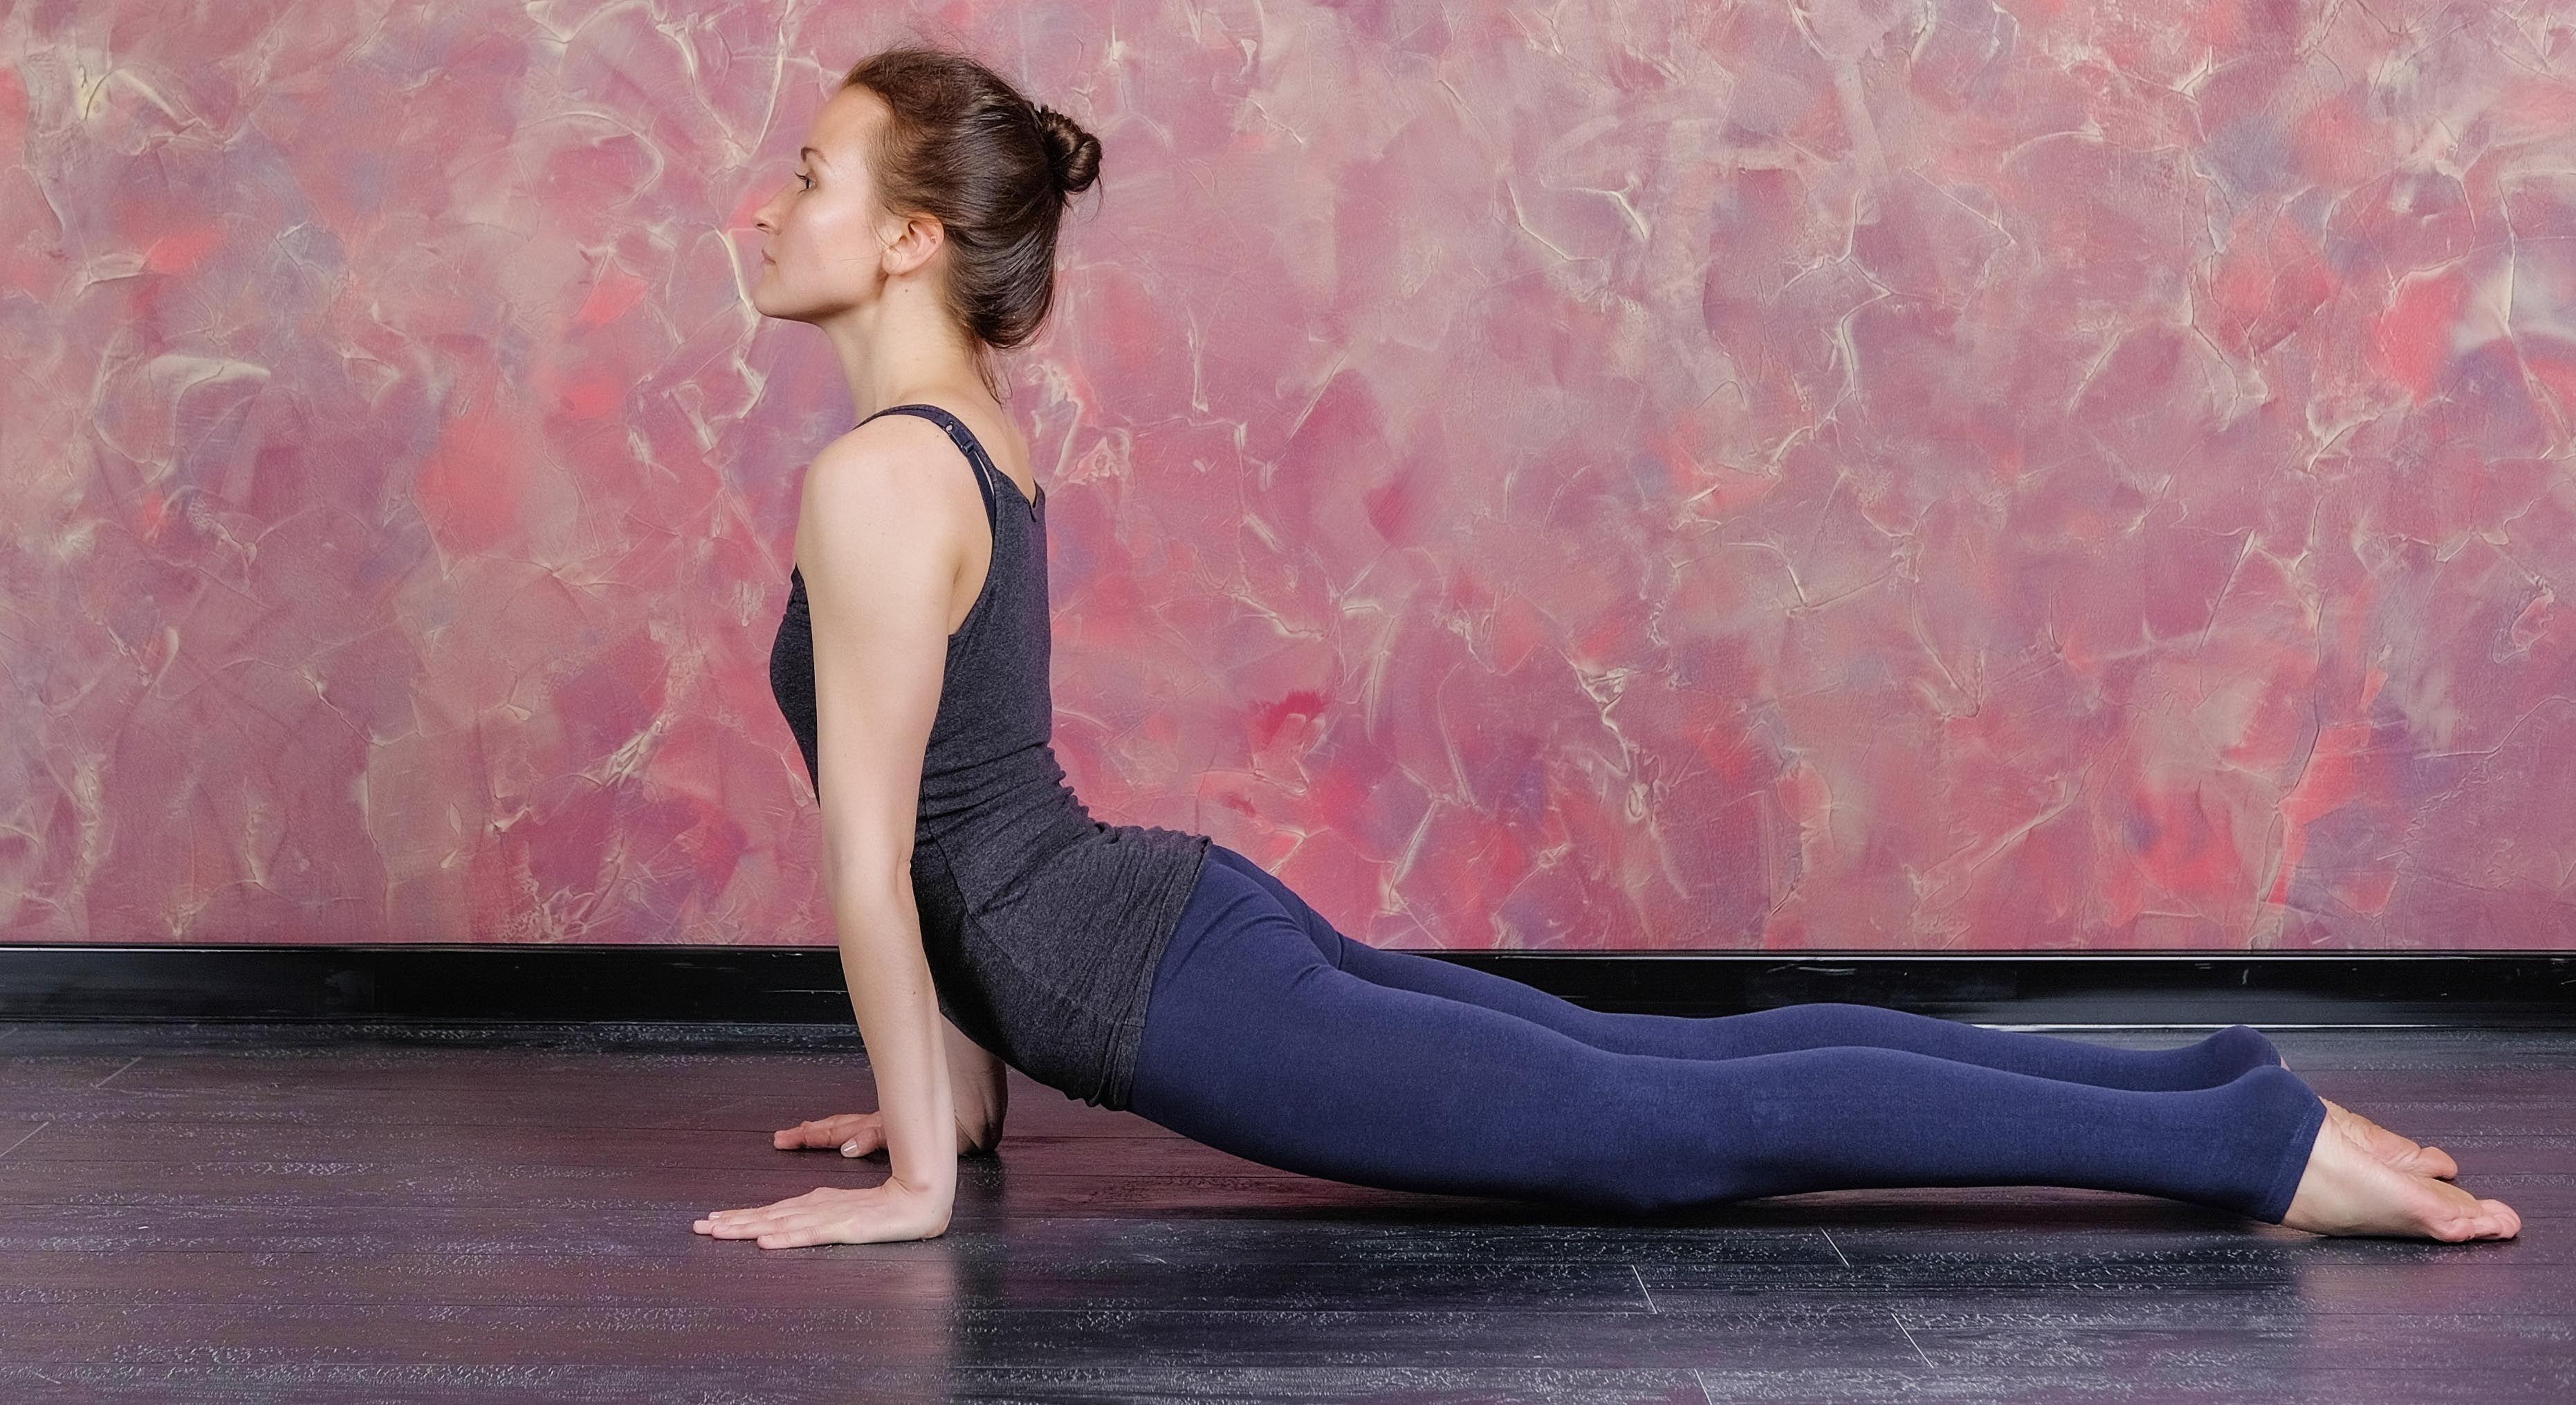 Woman practicing and stretching in a yoga studio. Basic yoga pose: upward facing dog or urdhva mukha svanasana.